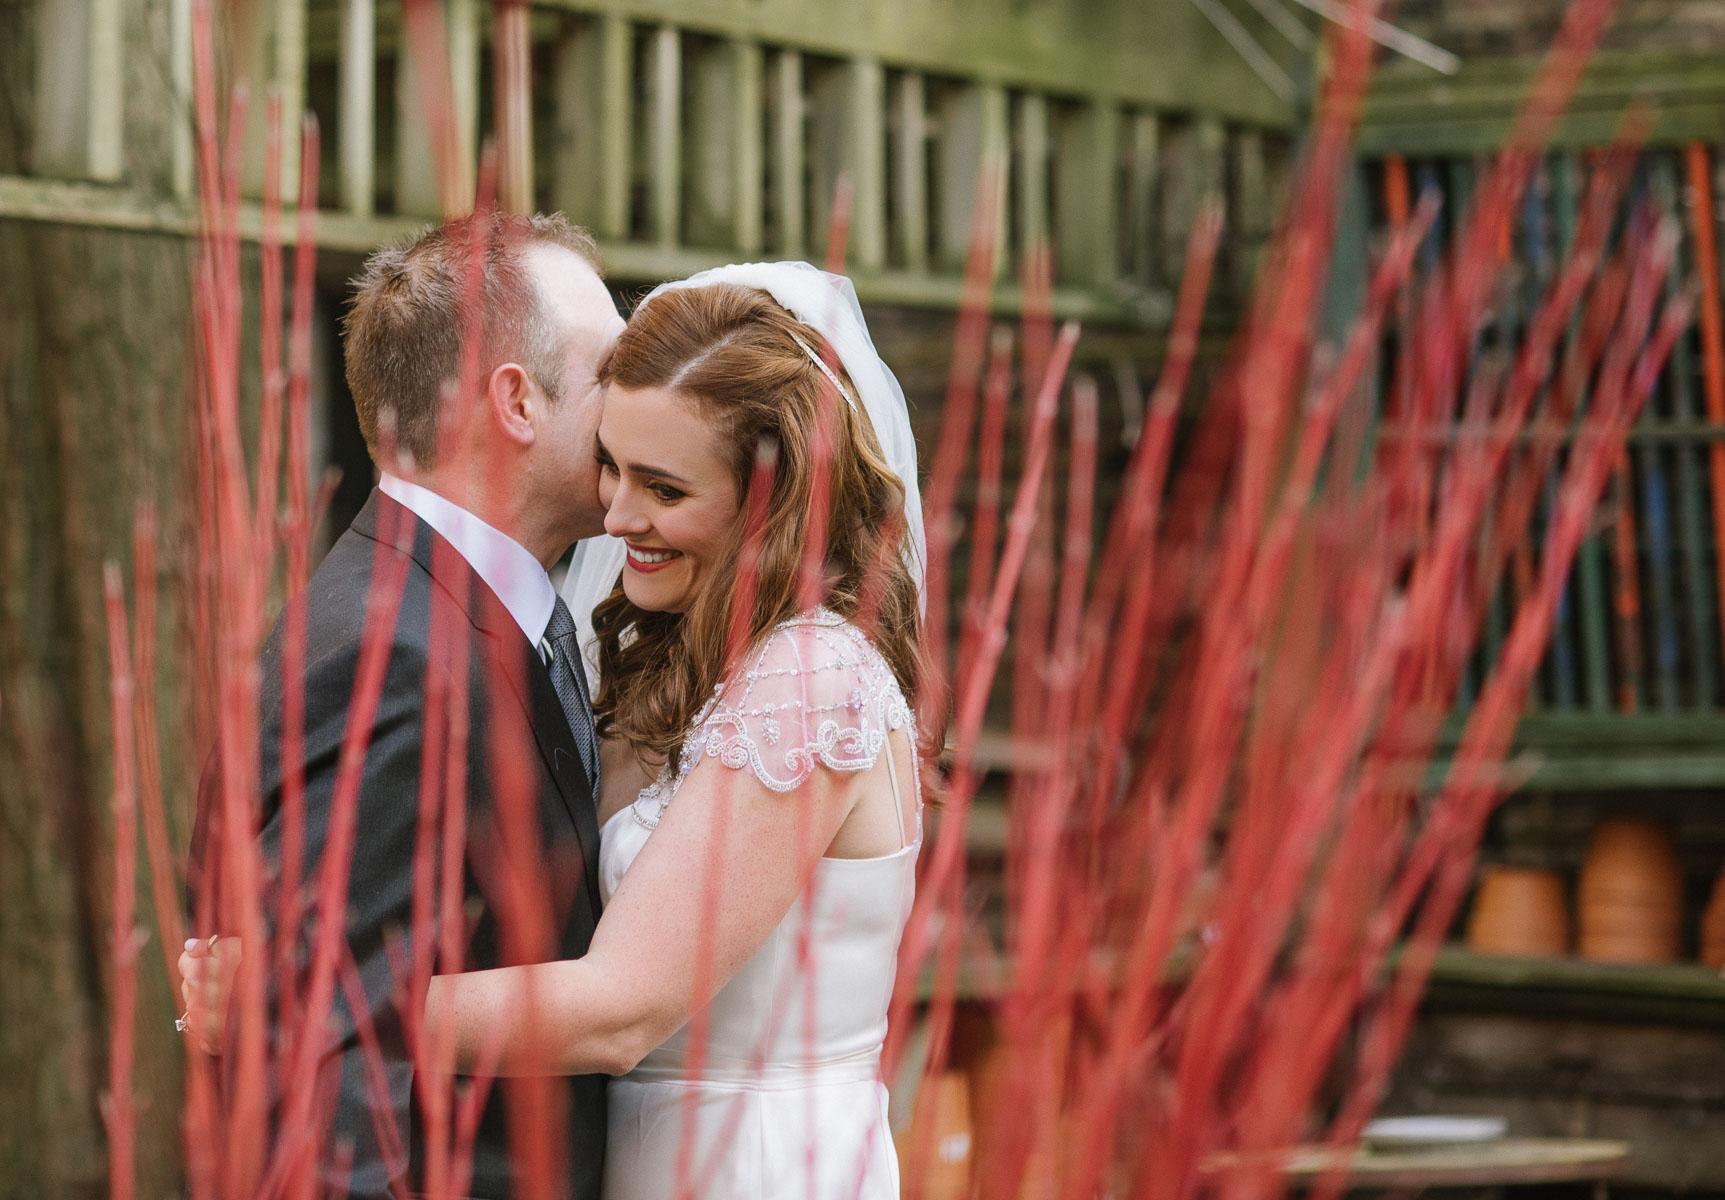 Pamela Yasuko Photography - A New Leaf Wedding - Chicago Oahu Photographer-31.jpg